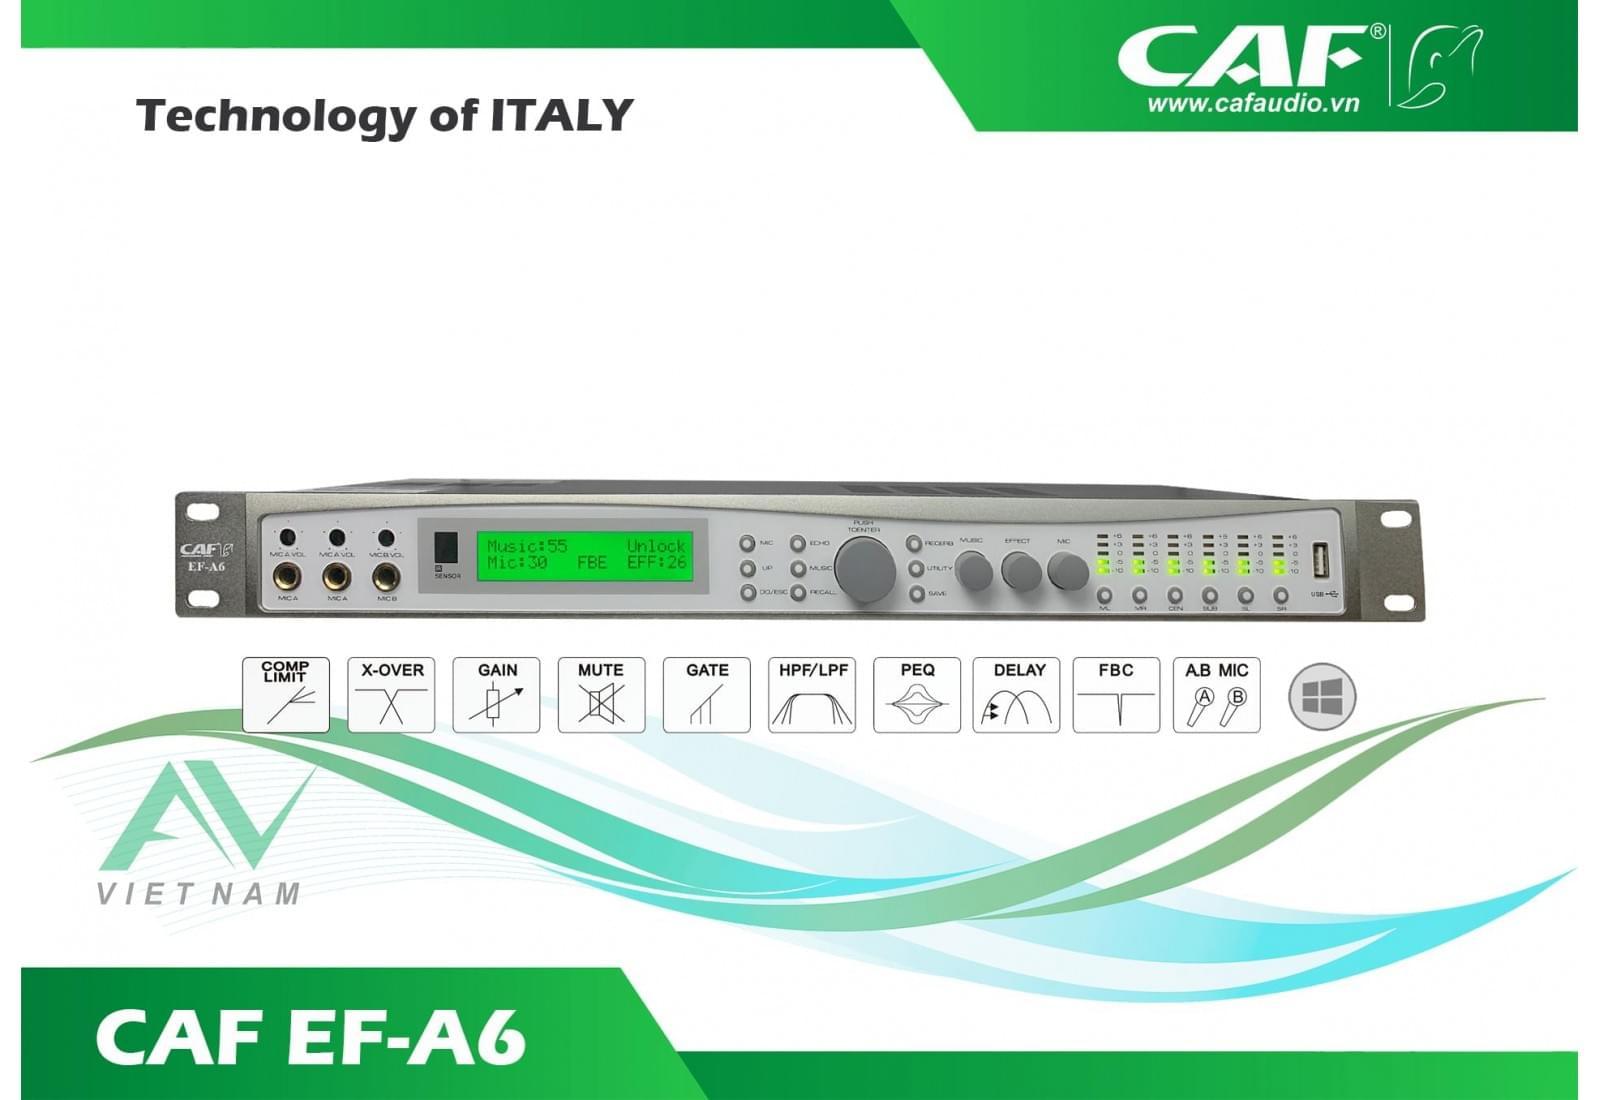 CAF EF-A6